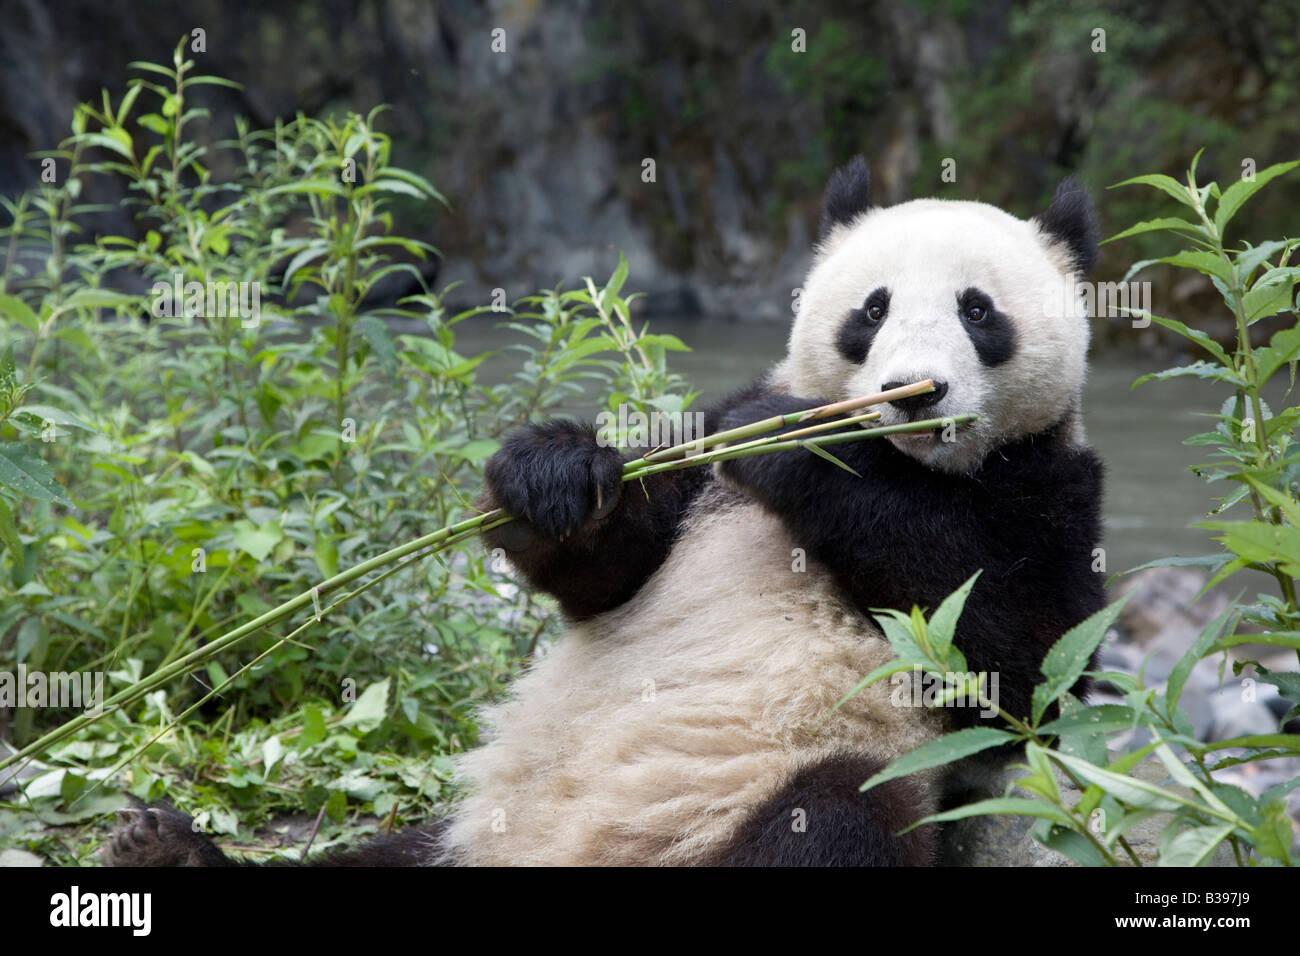 Grosser Panda Ailuropoda Melanoleuca Essen Bambus Neben Bach Im